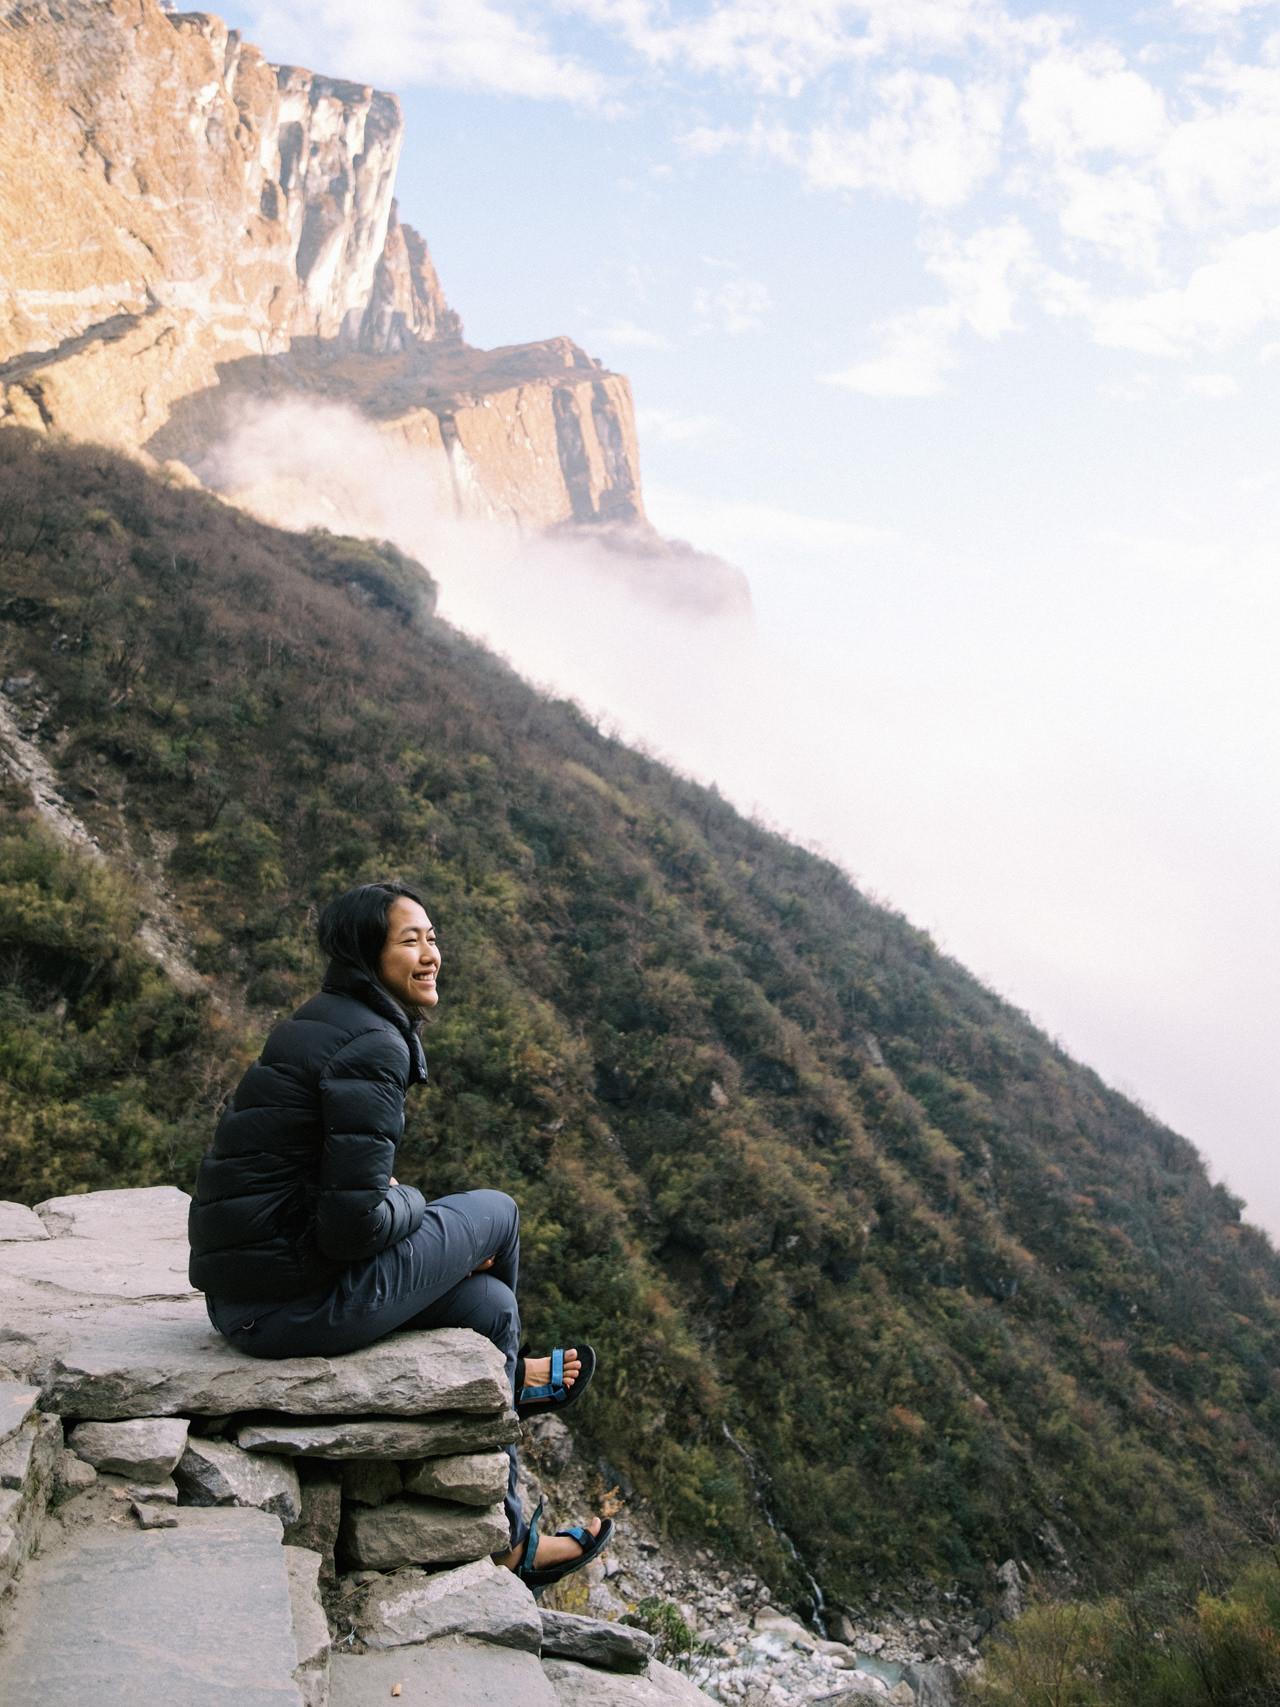 Nepal 2019 - Trekking Annapurna Base Camp 112